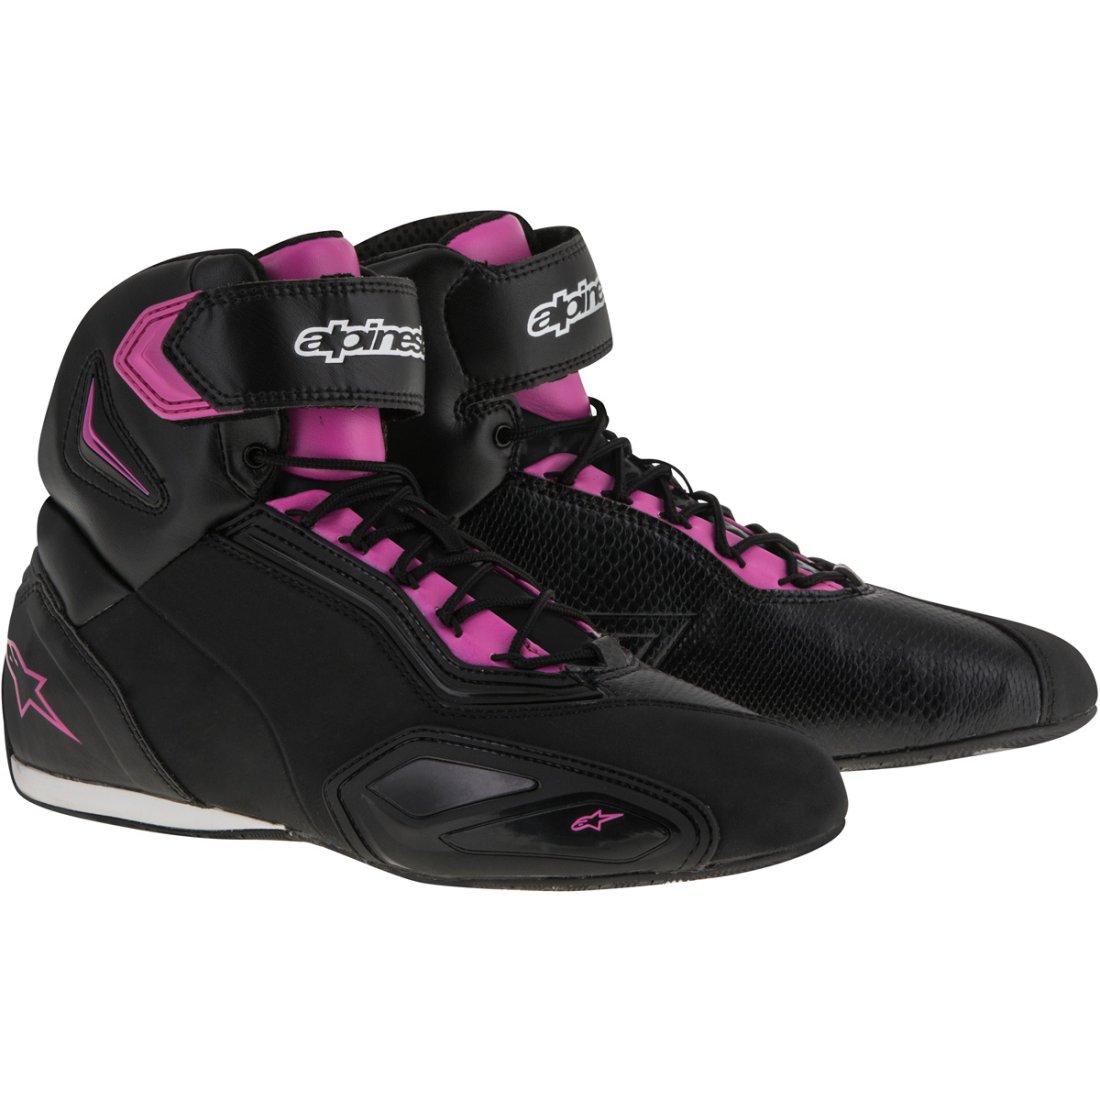 6c6a1d190cc32c ALPINESTARS Stella Faster-2 Lady Black   Fuchsia Boots · Motocard